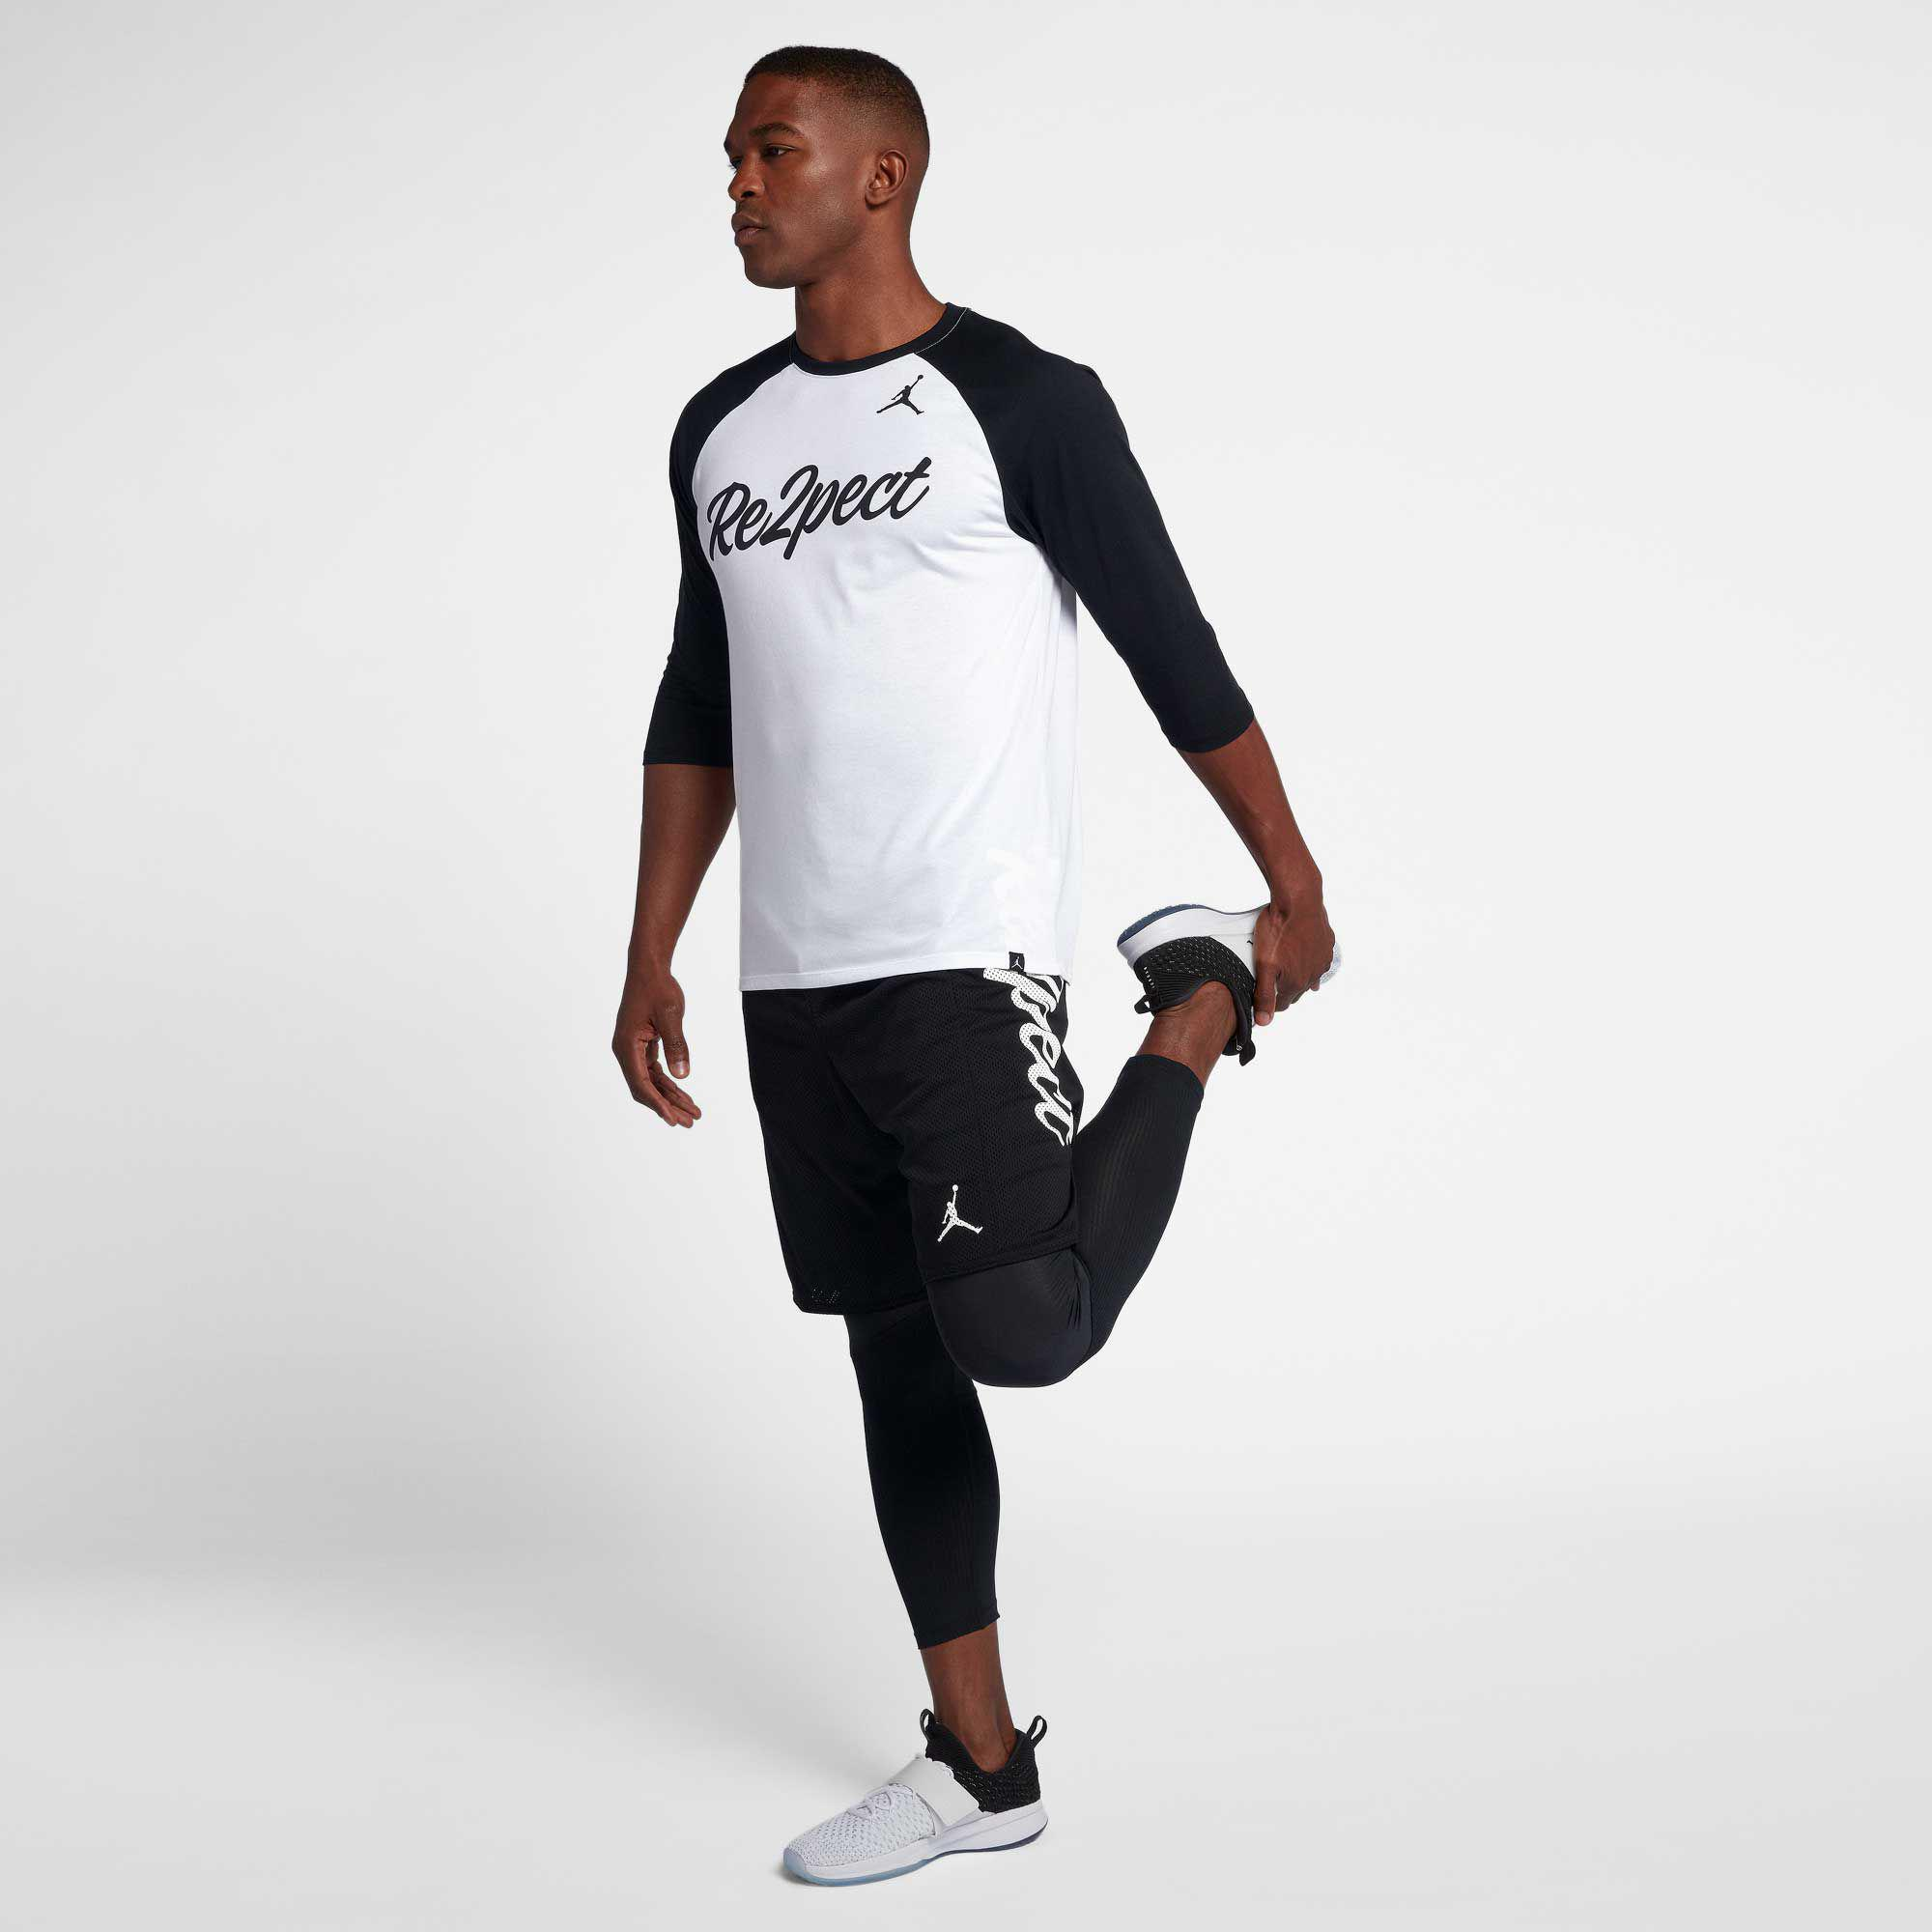 89f884e5745a66 Lyst - Nike Jordan Re2pect Raglan Tee in White for Men